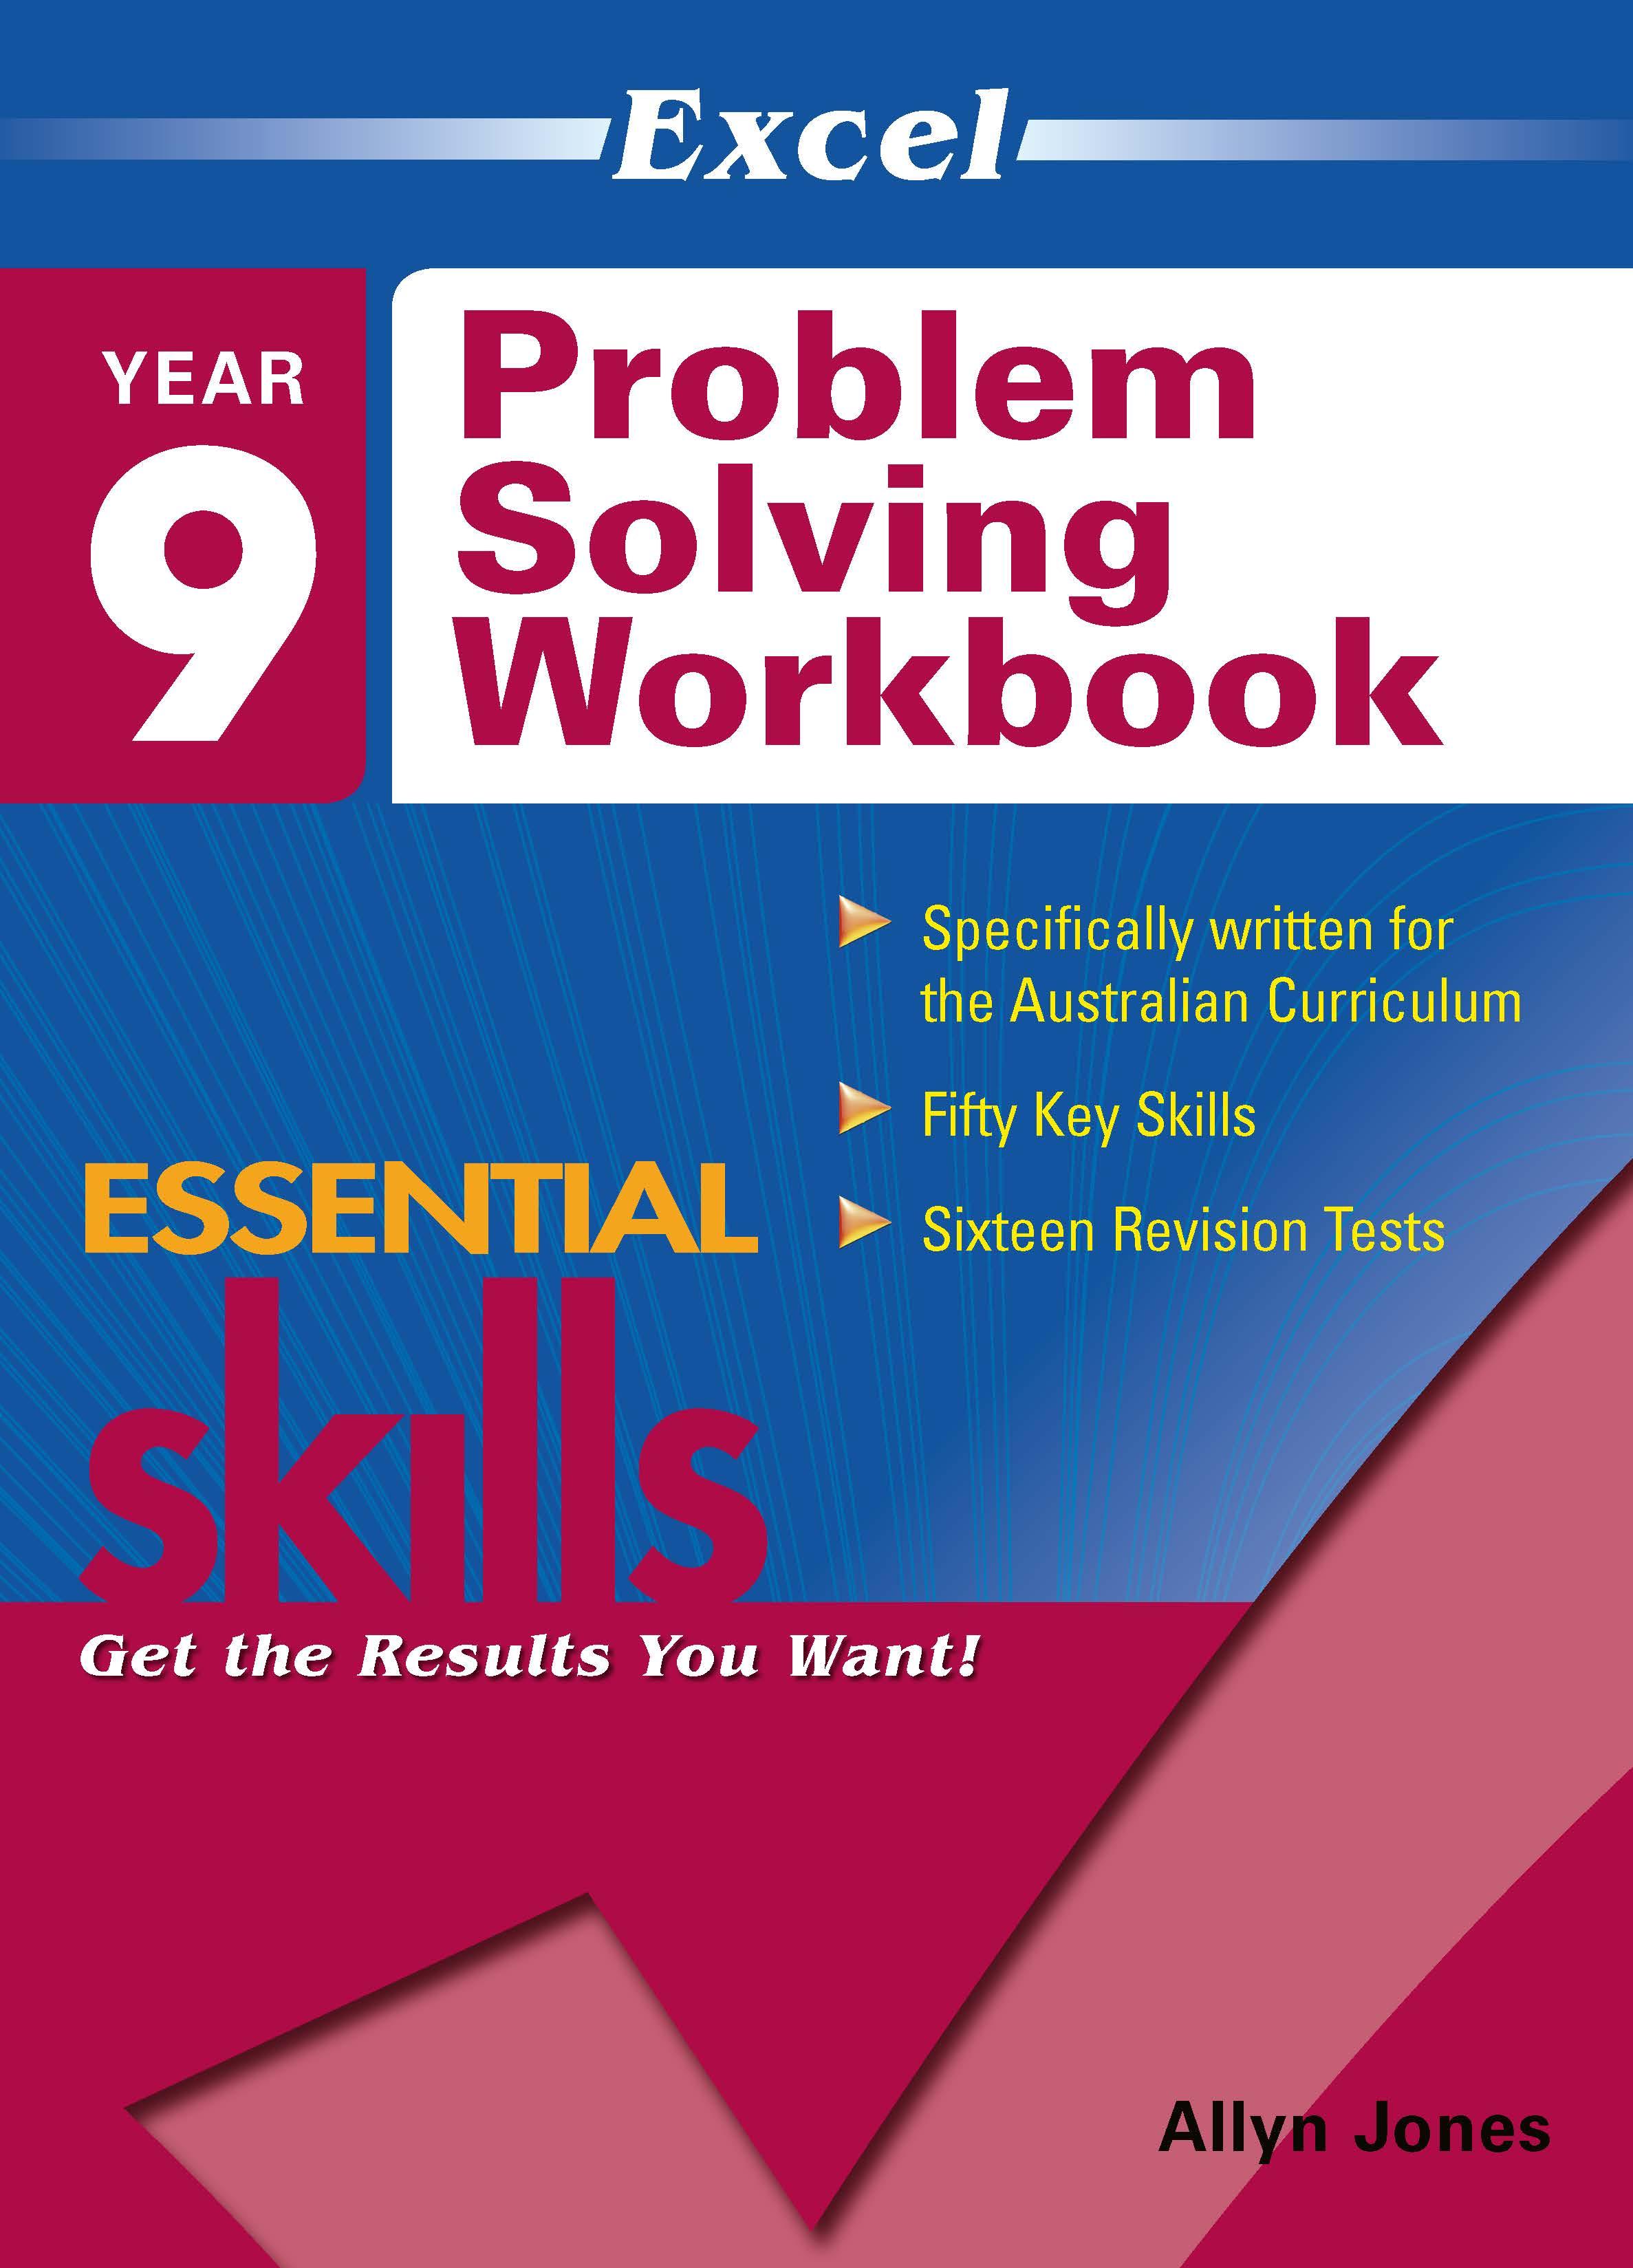 Excel Essential Skills: Problem Solving Workbook Year 9